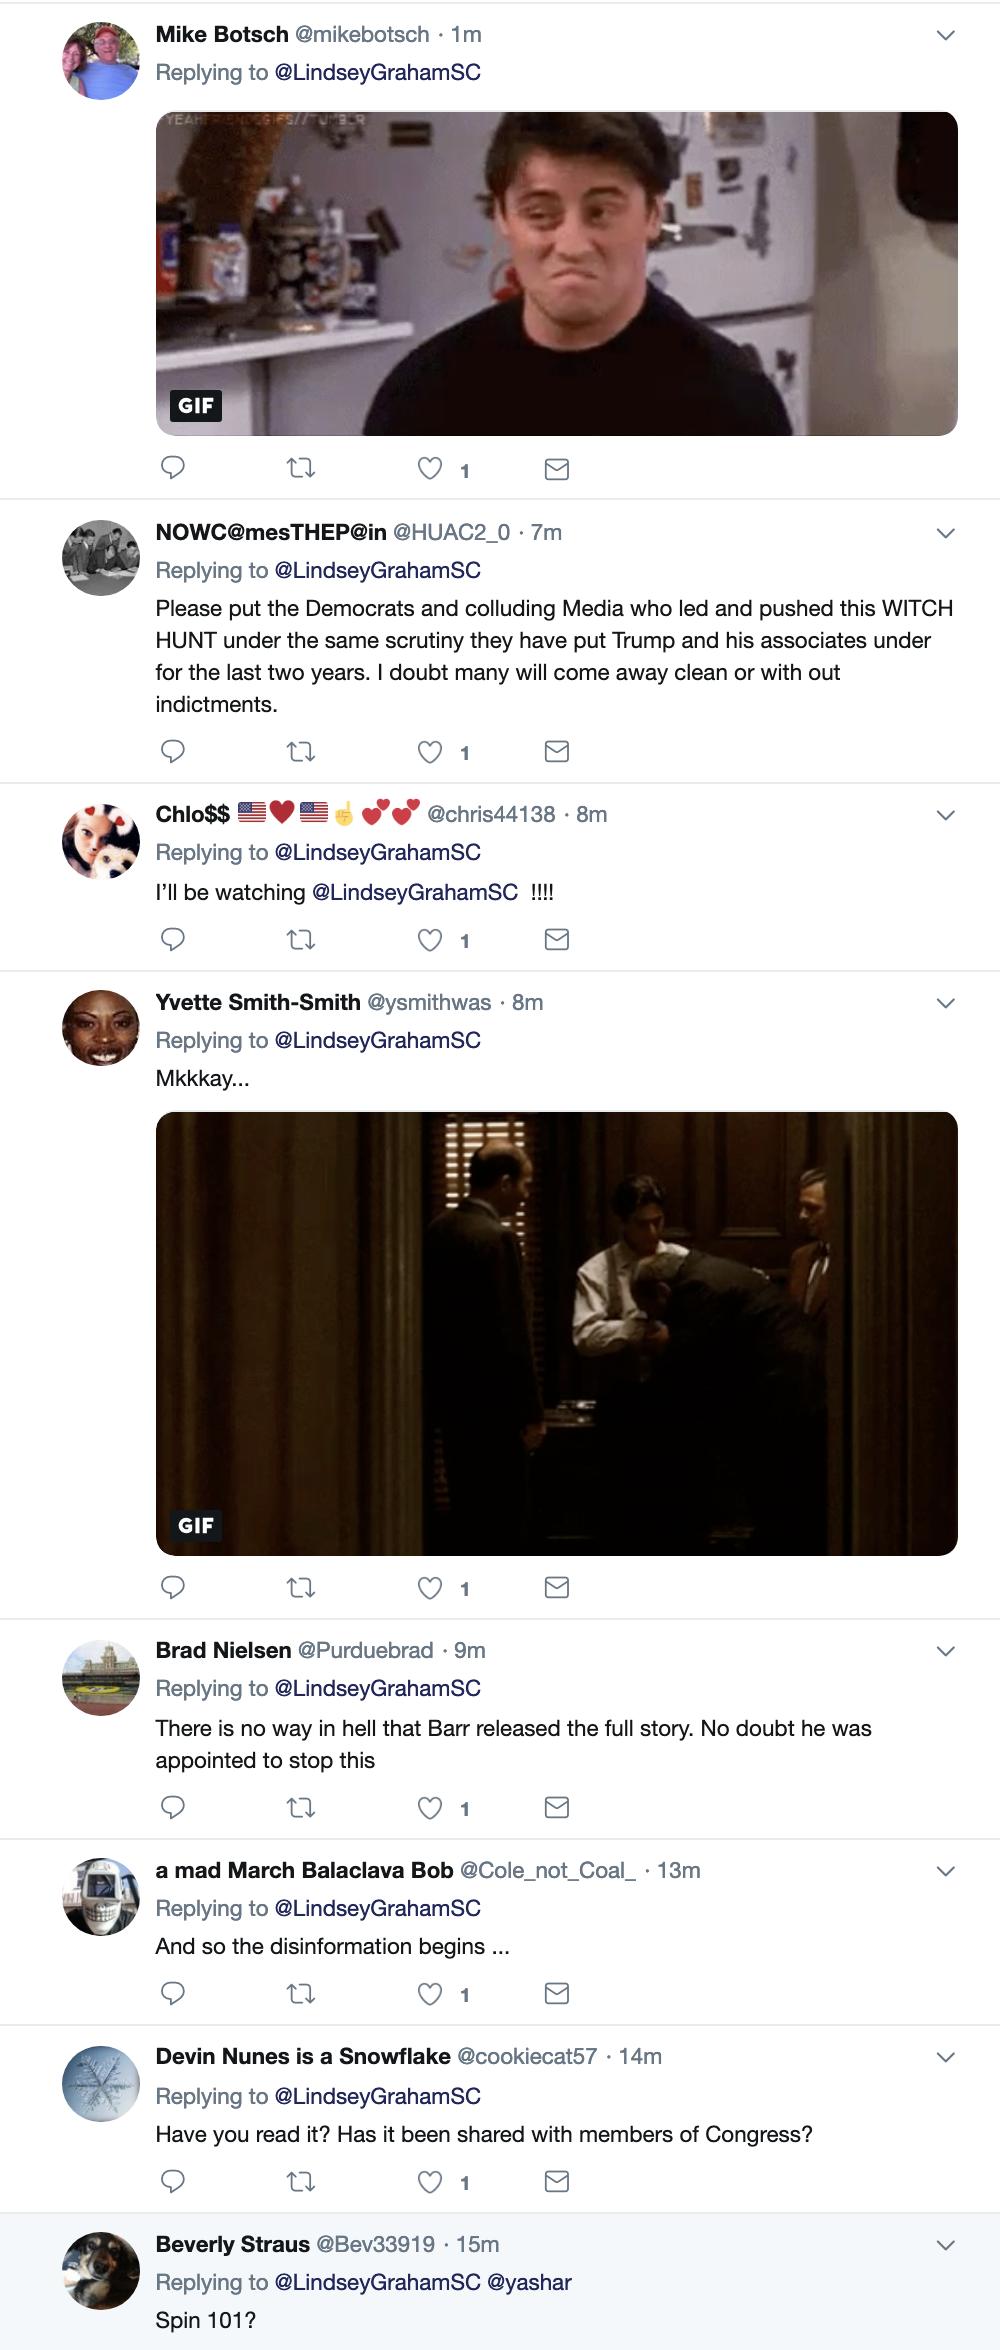 Screen-Shot-2019-03-25-at-8.53.41-AM Graham Makes Mueller Report Announcement On Twitter Monday Corruption Crime Donald Trump Election 2016 Mueller Politics Robert Mueller Russia Top Stories